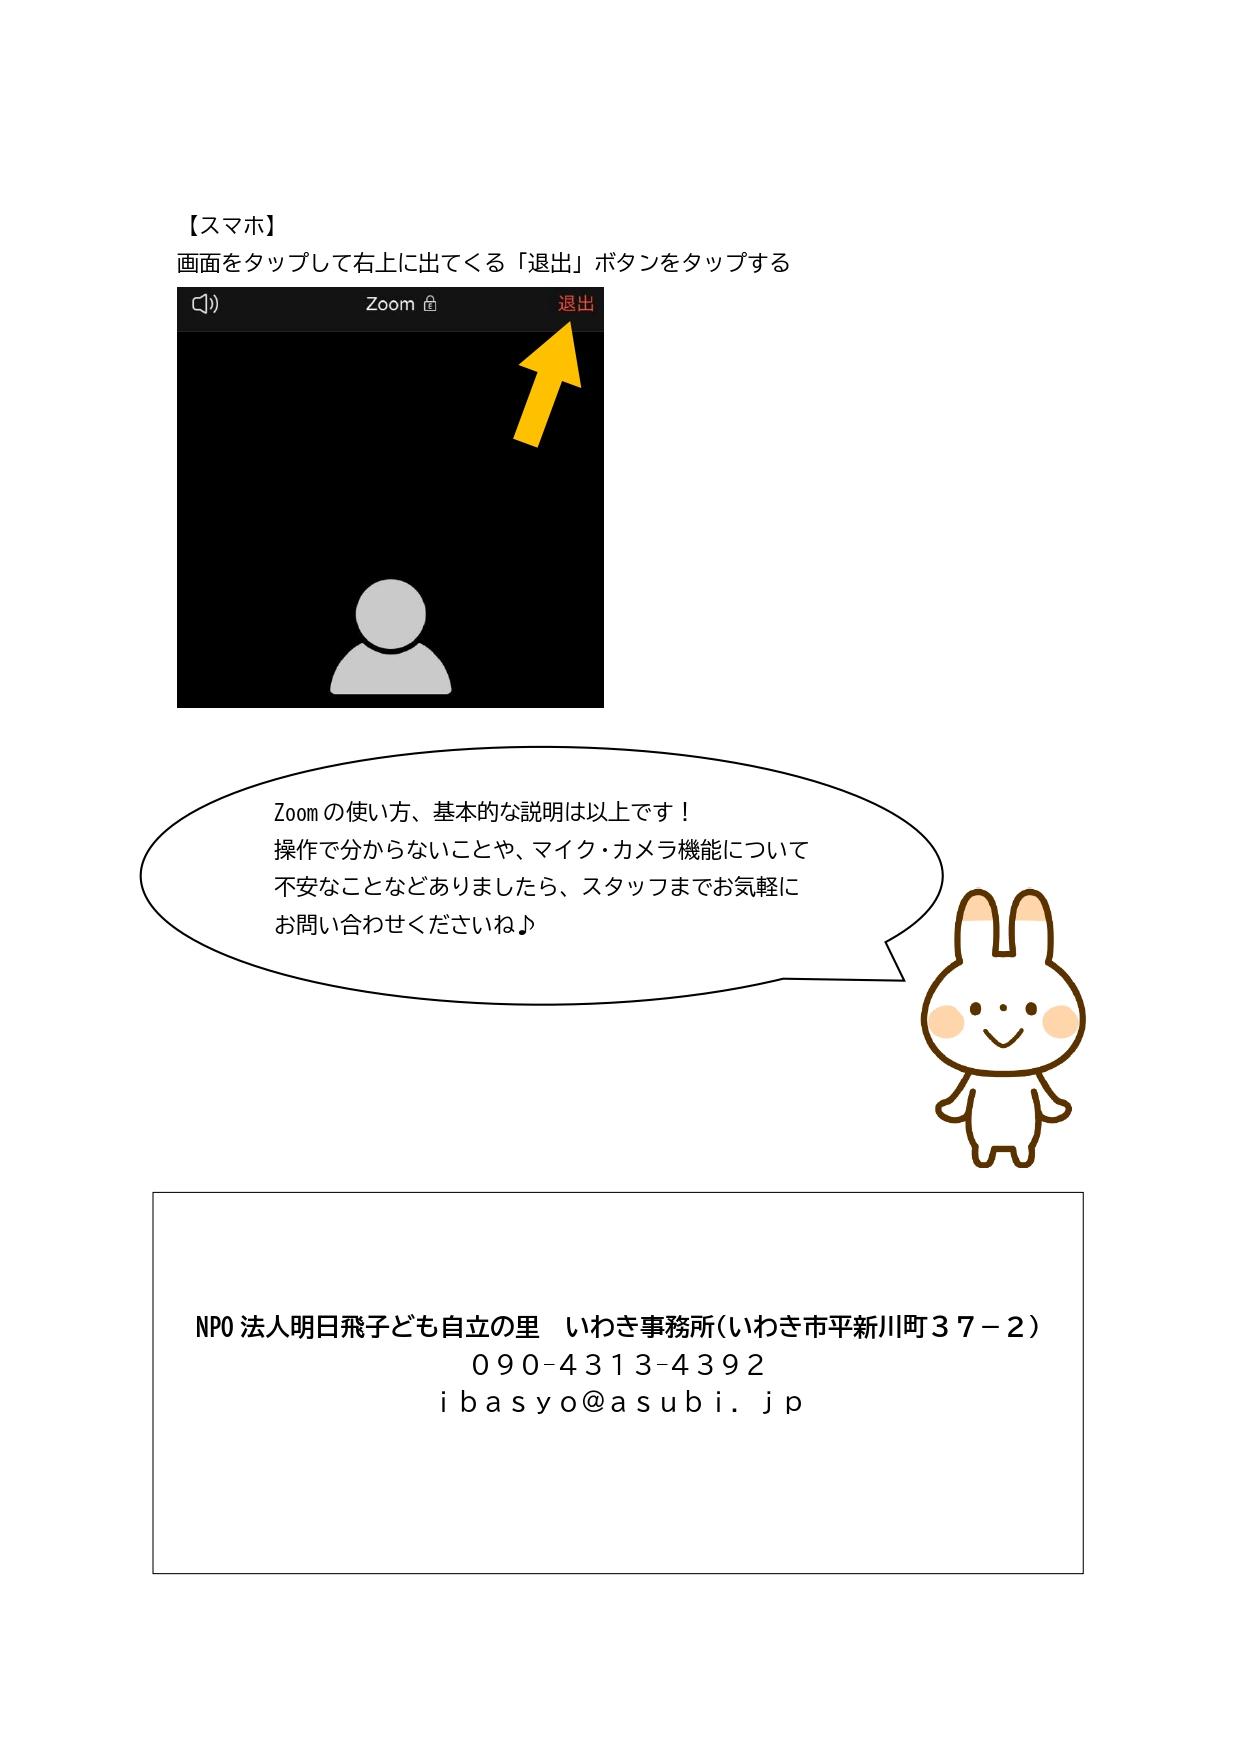 Zoomの使い方 (6)